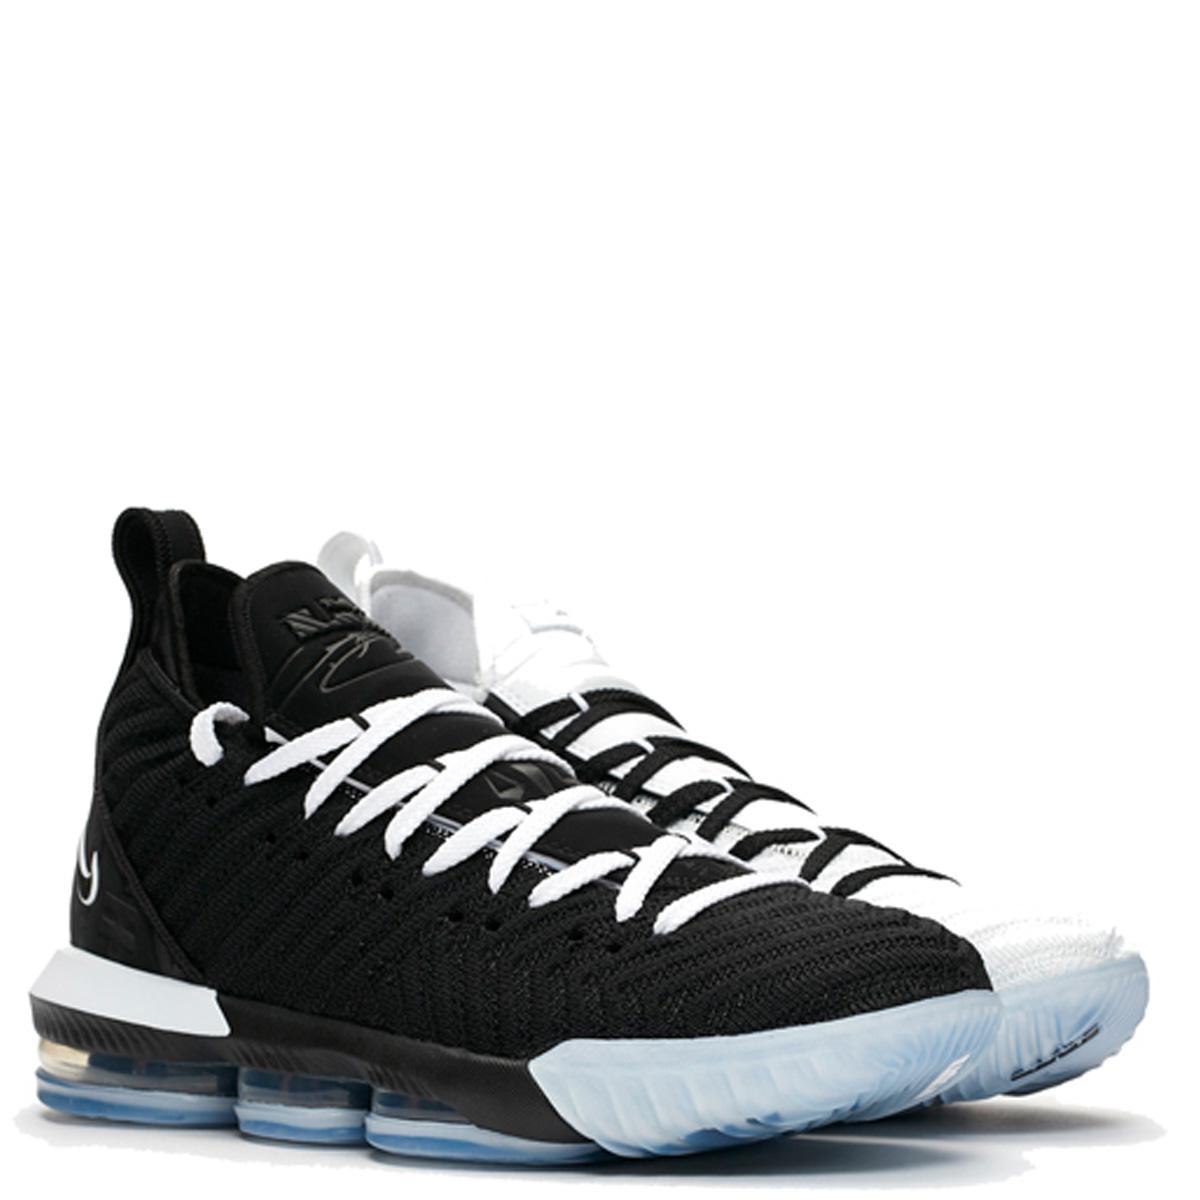 new product 13b06 b4b31 Nike NIKE Revlon 16 sneakers men LEBRON 16 EQUALITY black white black and  white BQ5970-100 [197]